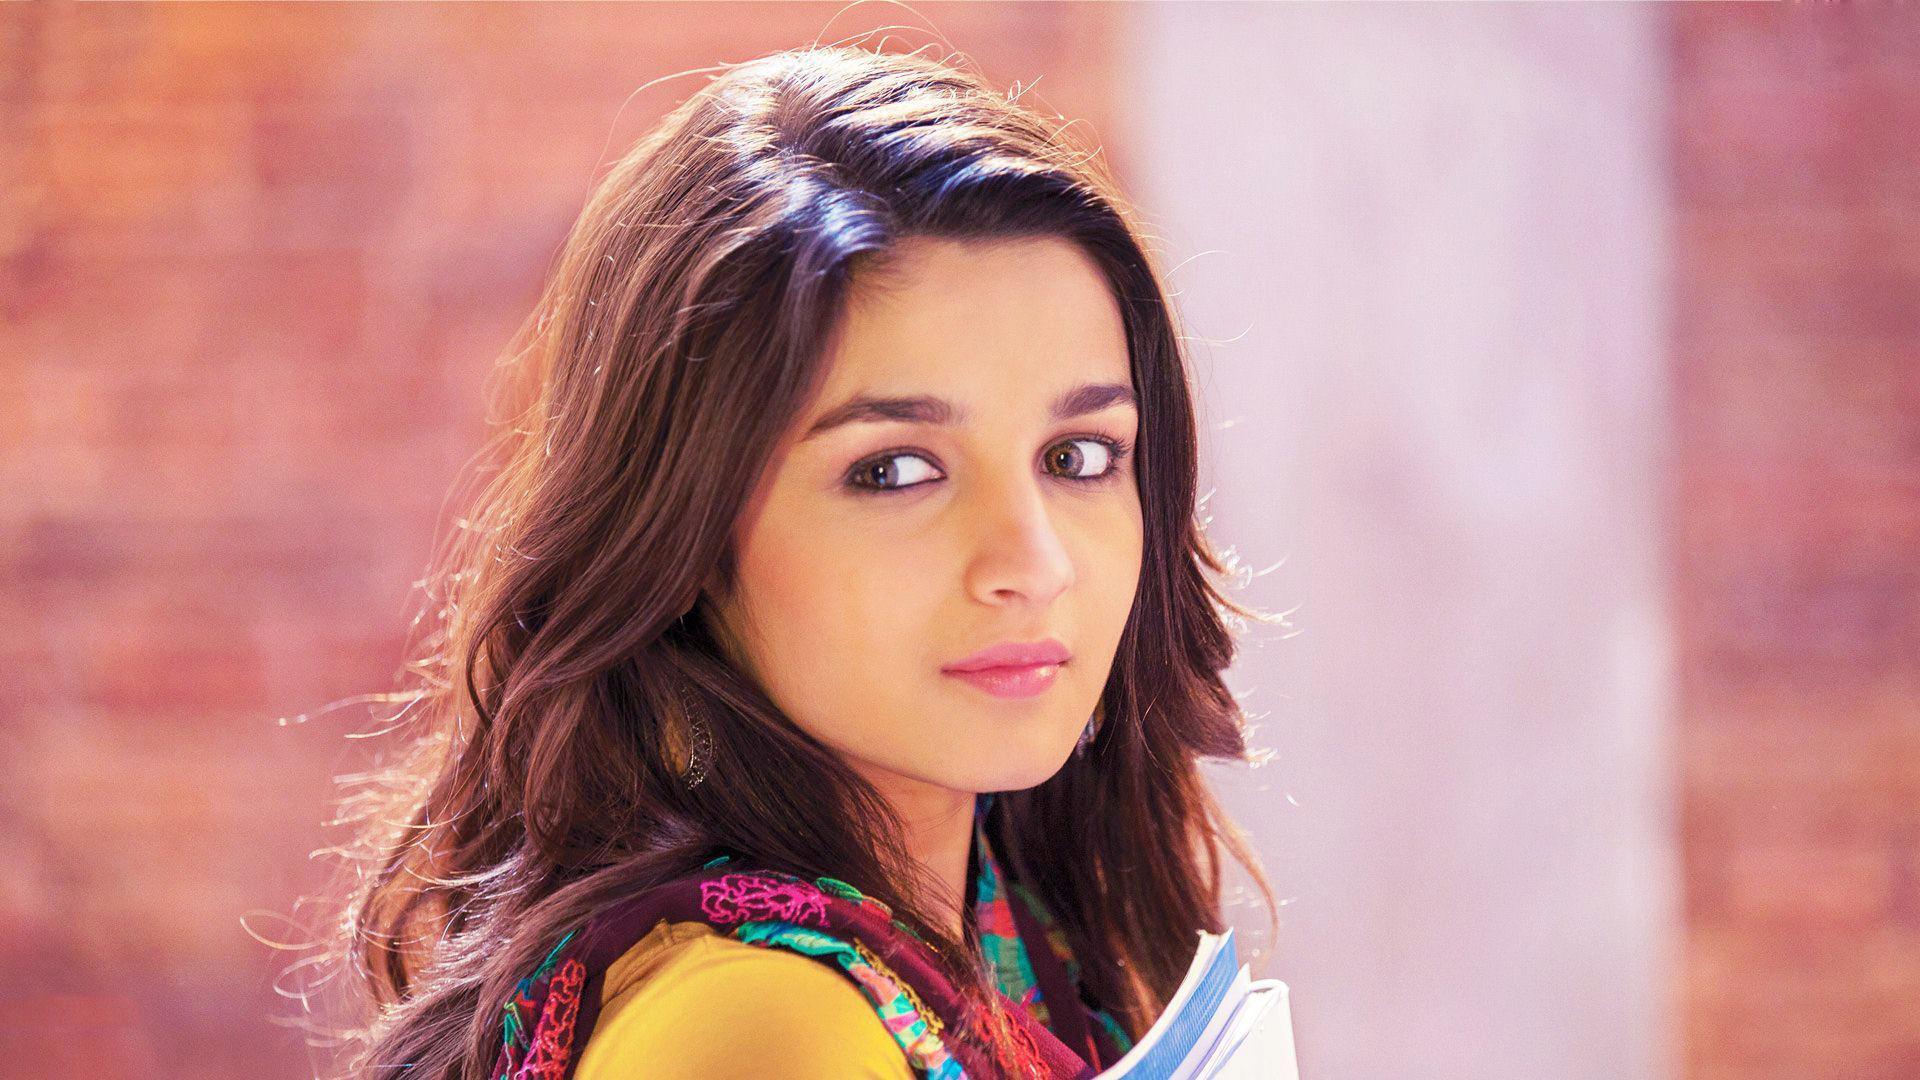 HD Beautiful Alia Bhatt Pink Lips High Quality Photo Wallpaper